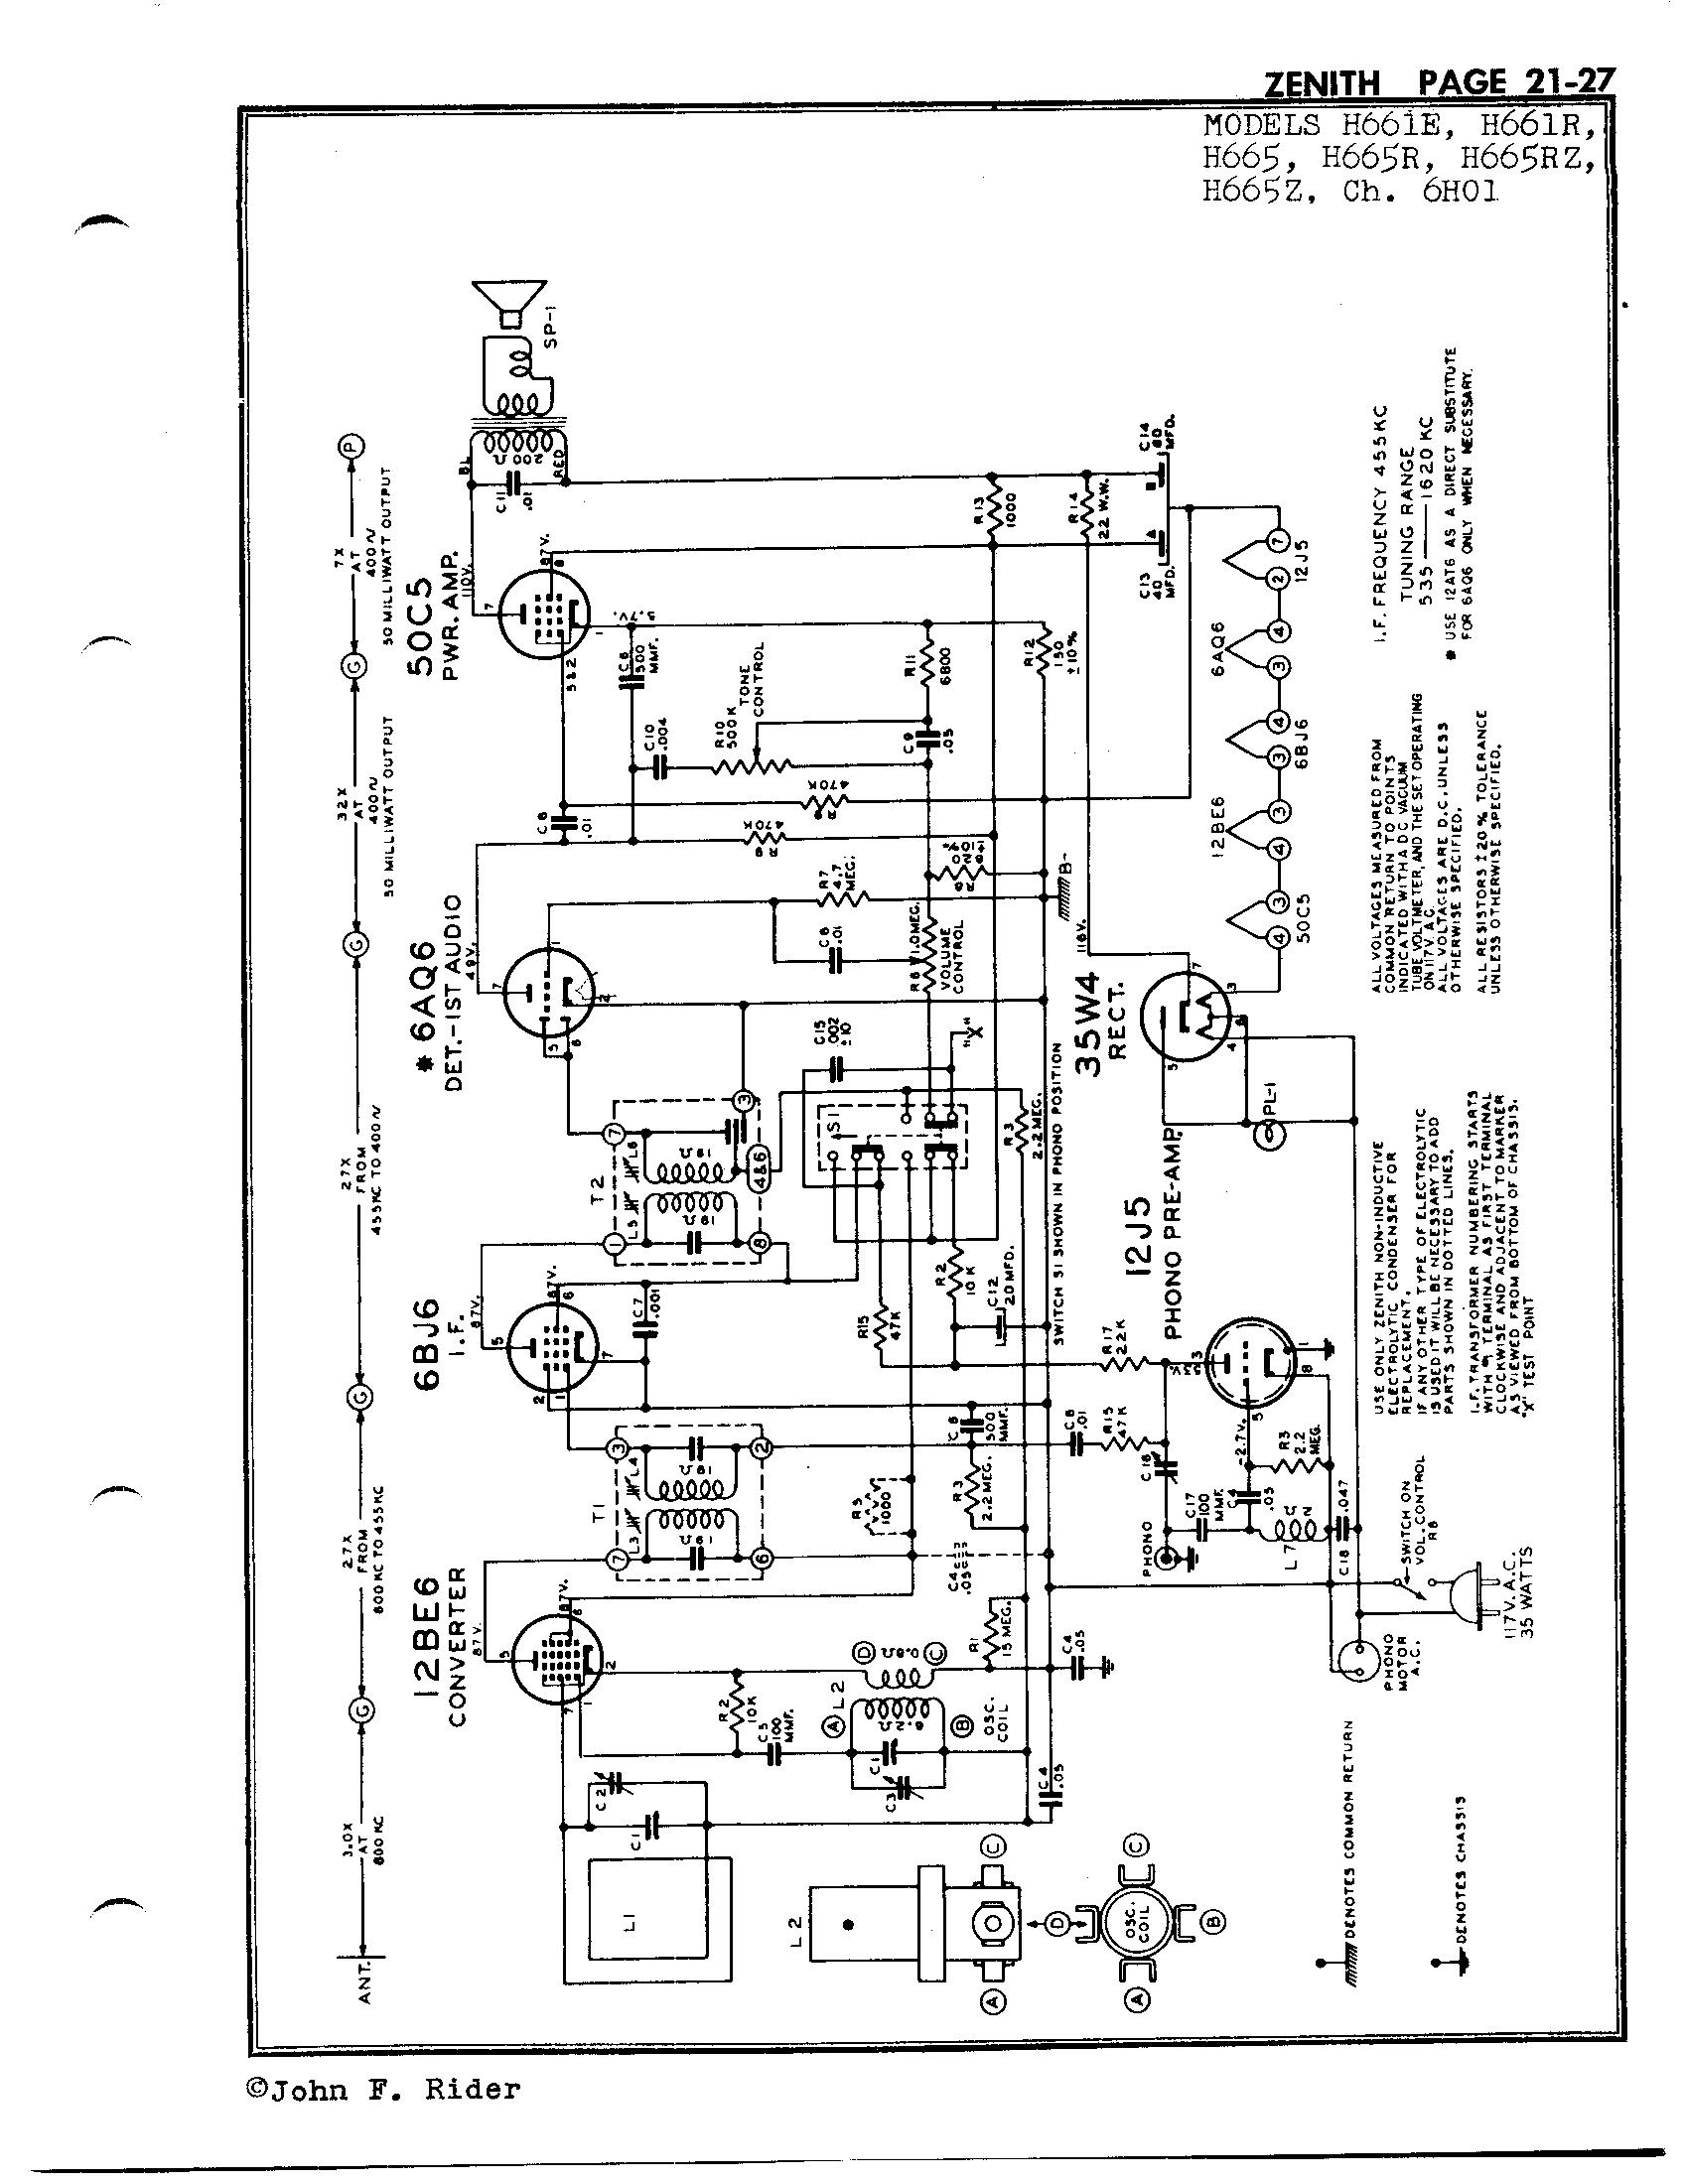 Zenith Radio Corp H665